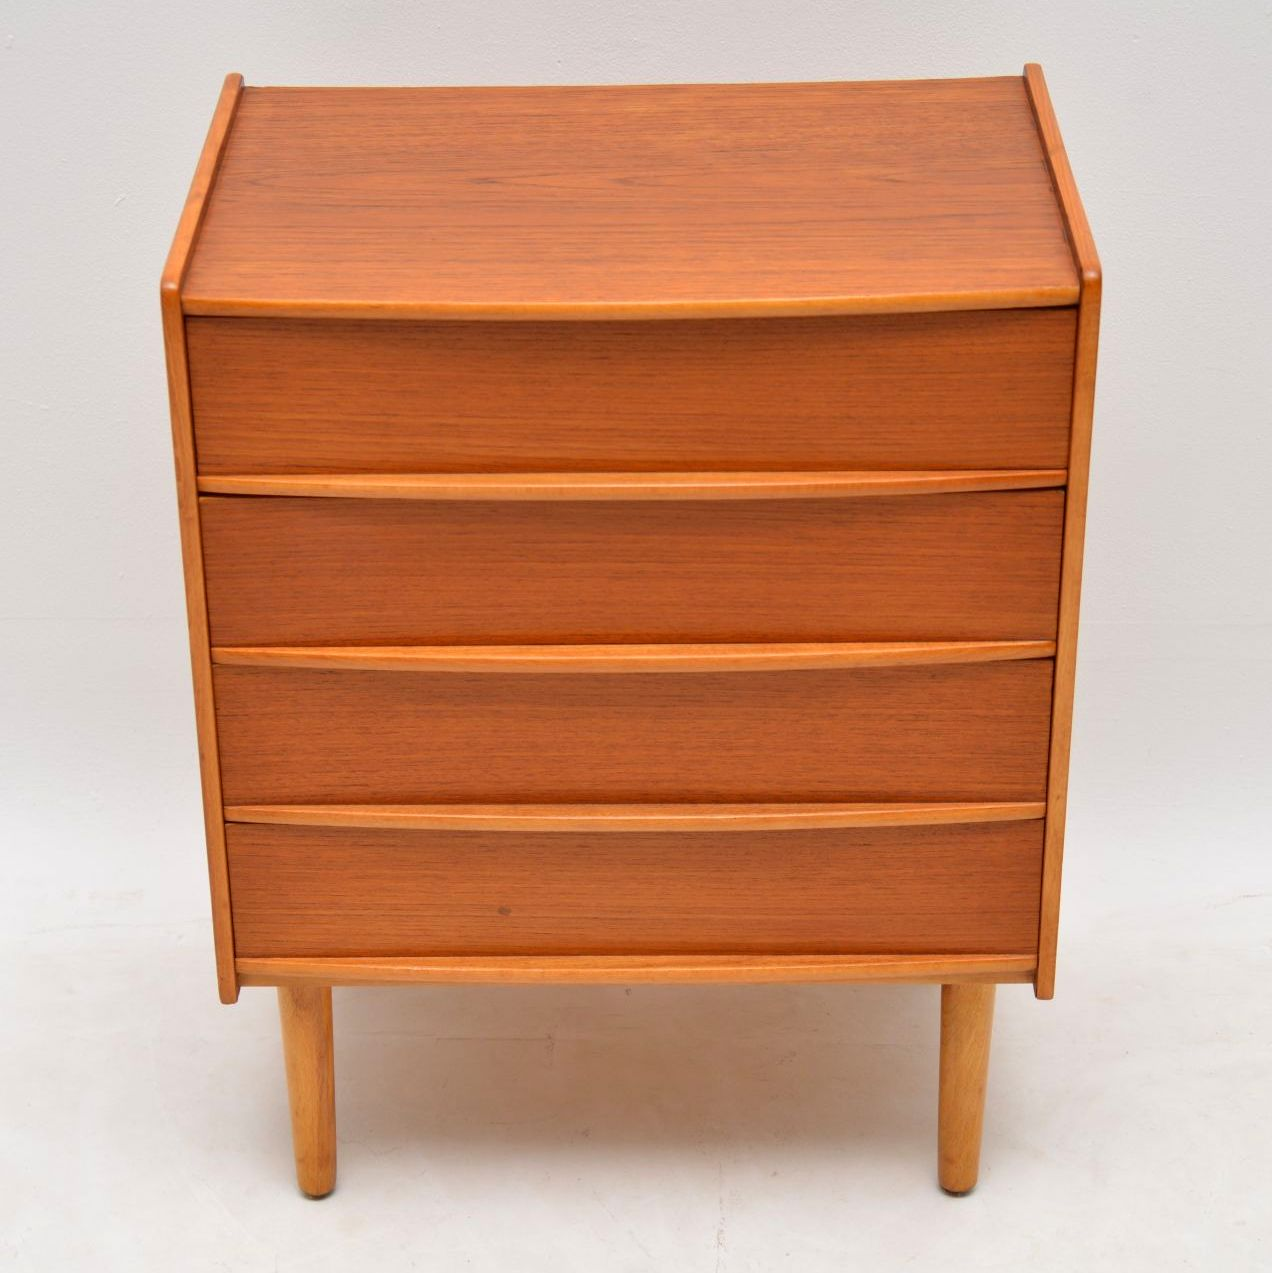 danish_teak_retro_vintage_chest_of_drawers_4